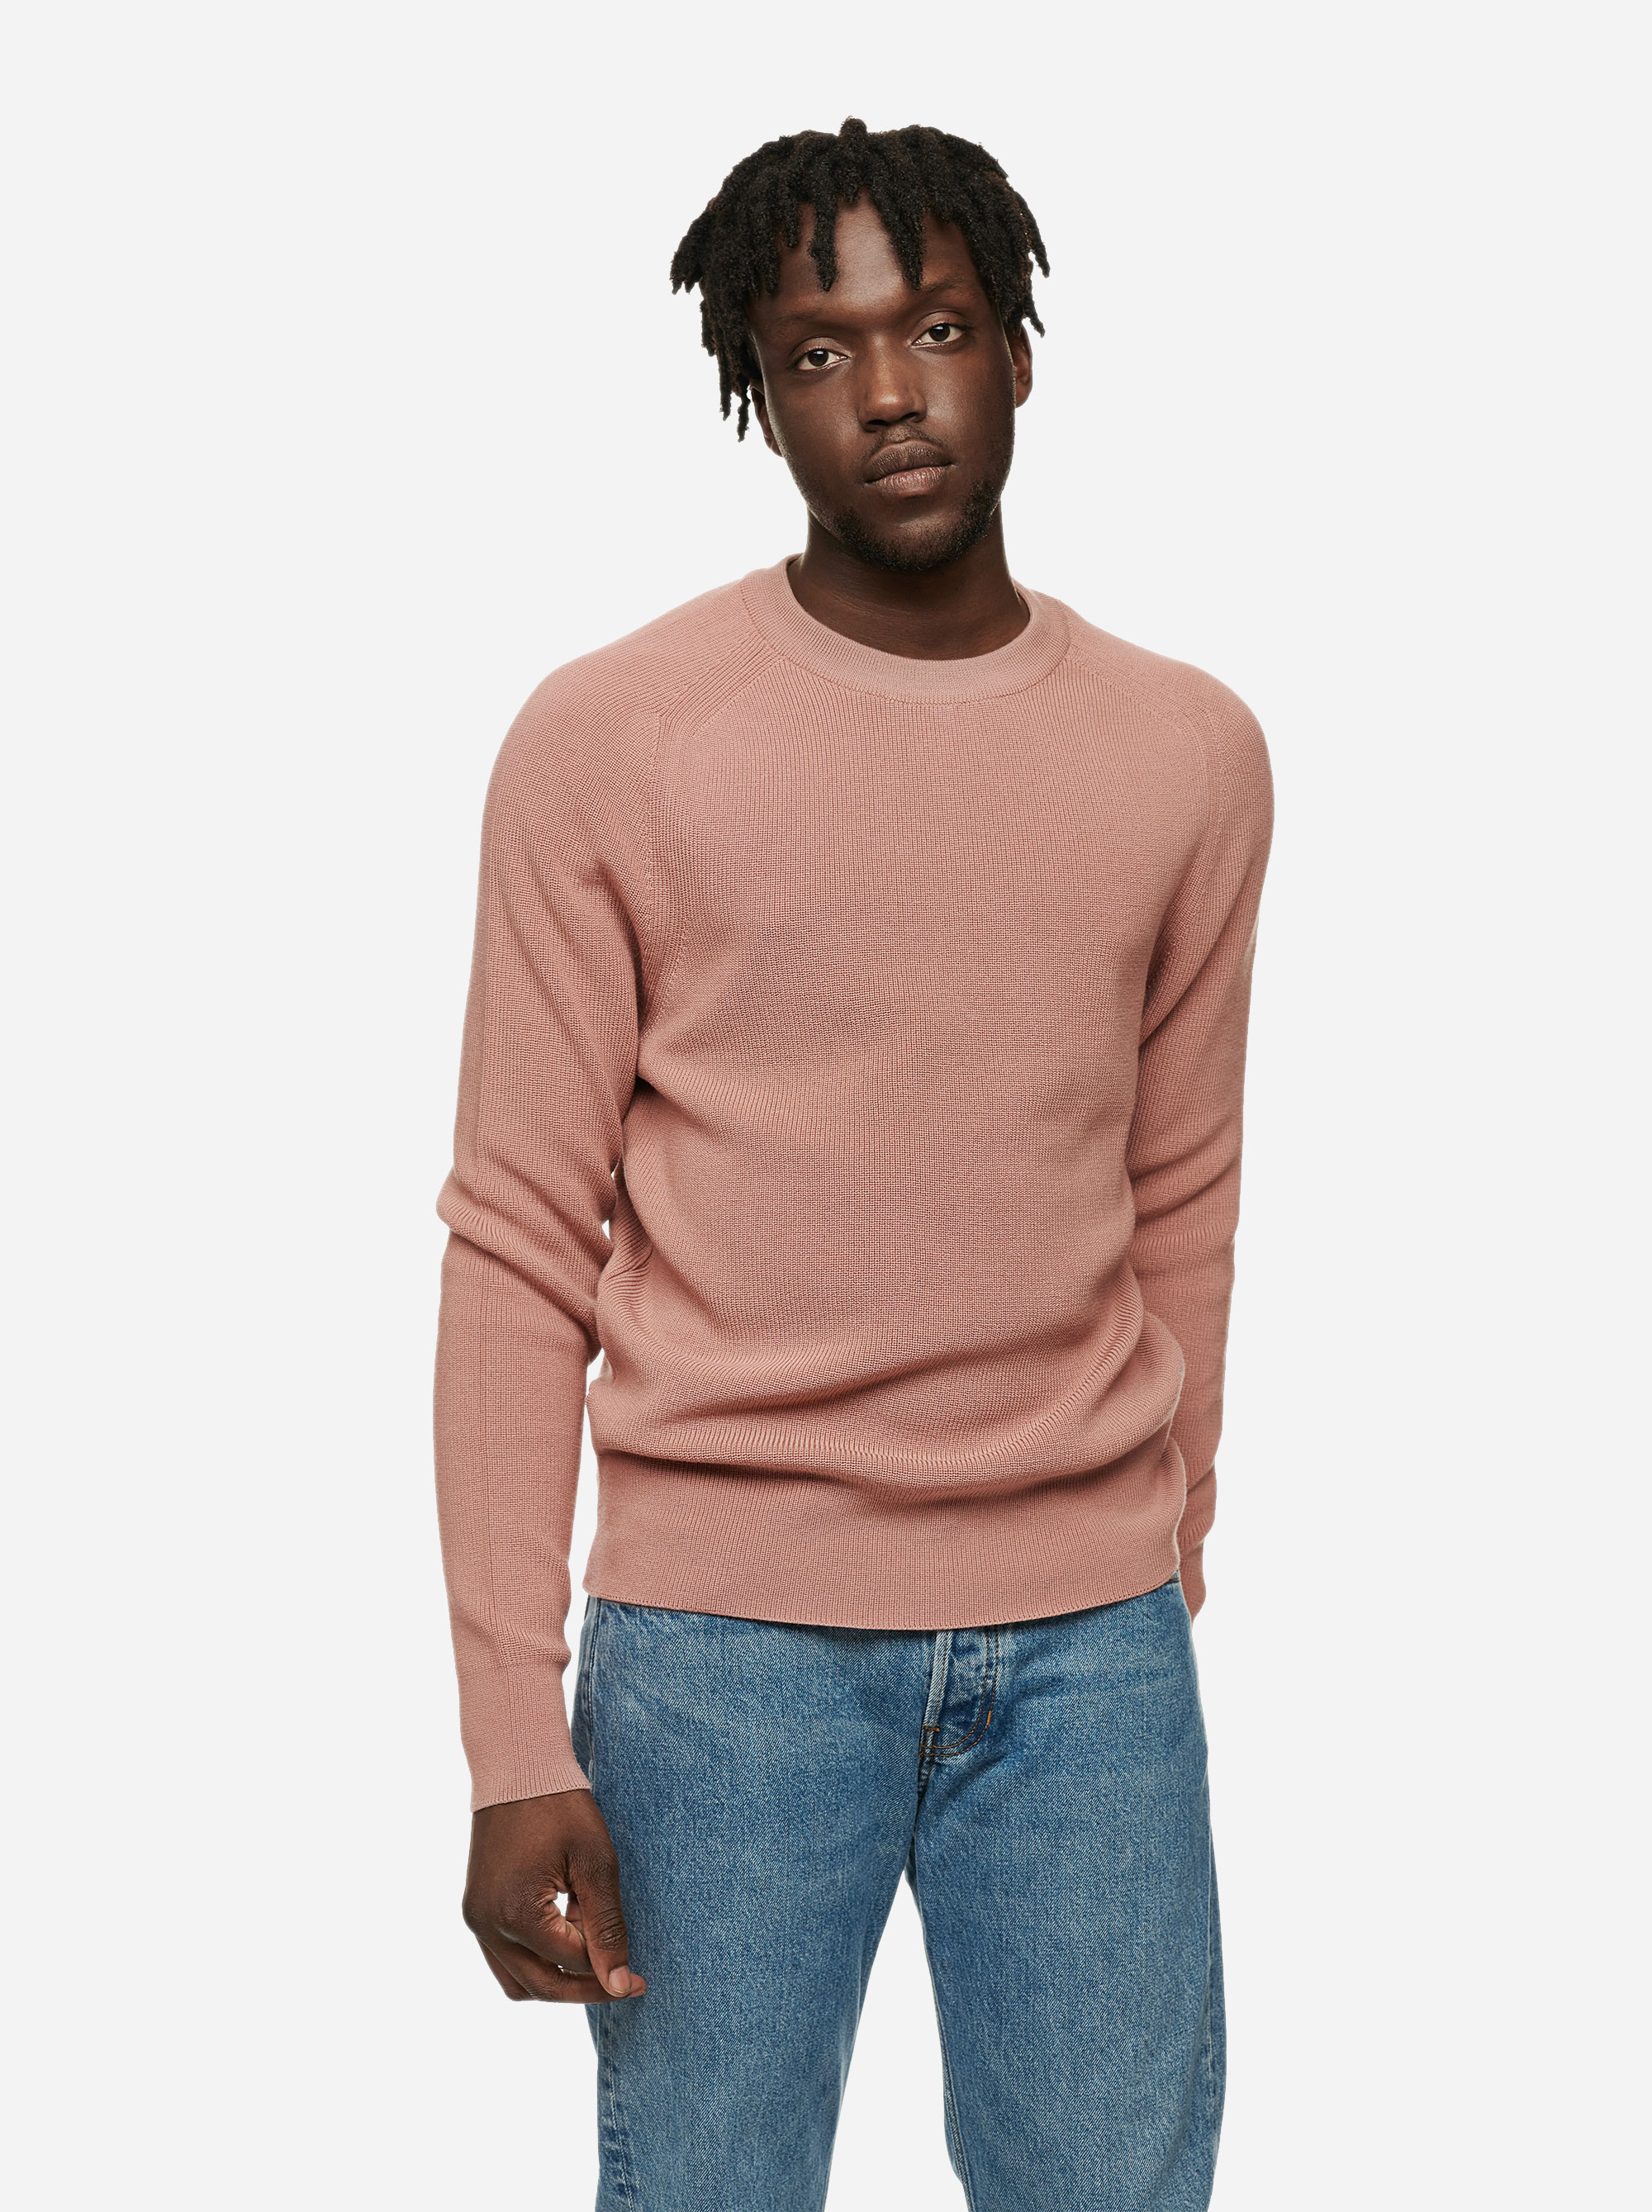 Teym - The Merino Sweater - Men - Pink - 2